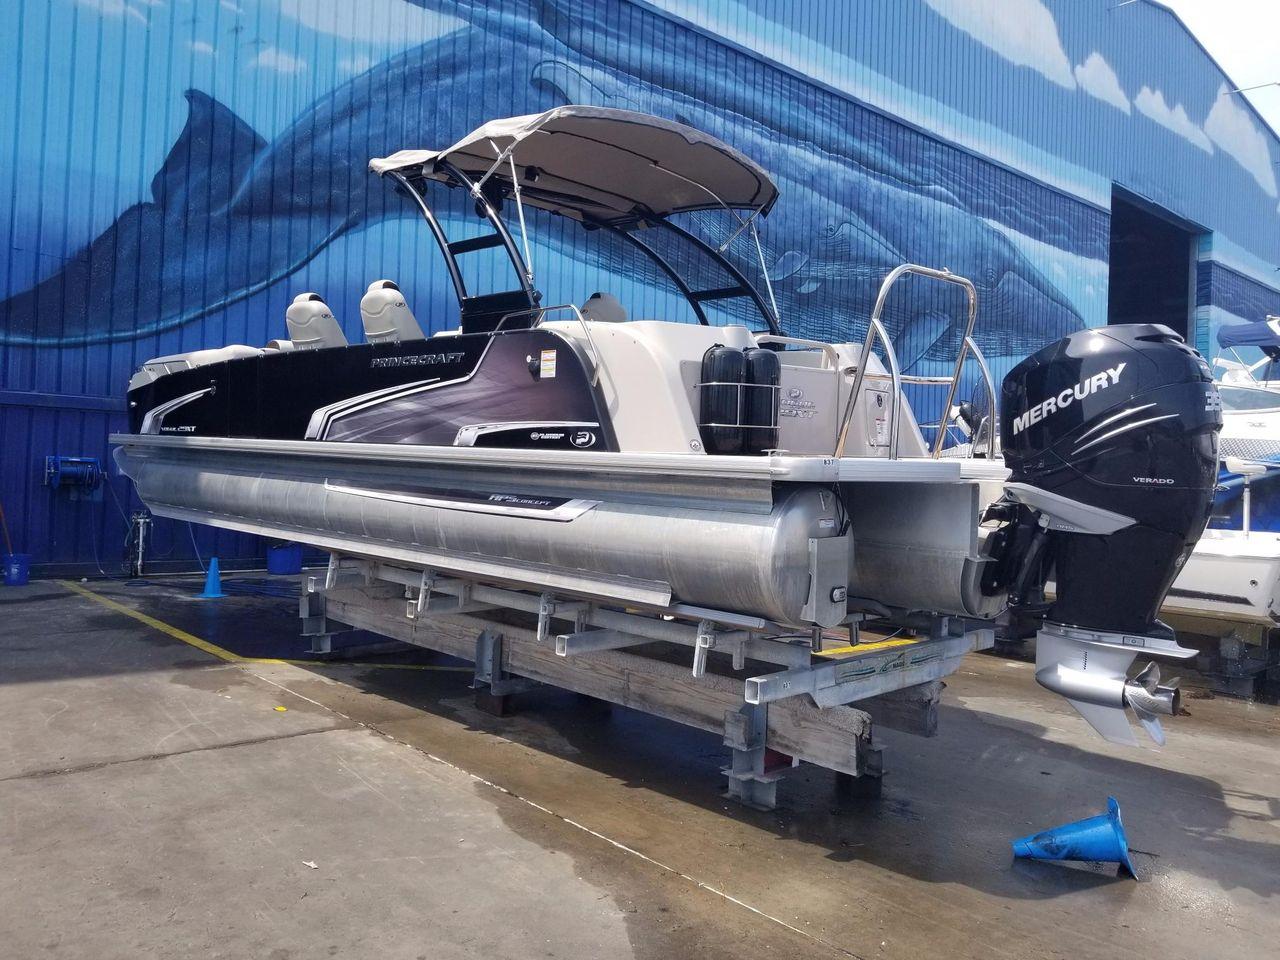 2018 Used Princecraft 29 Vogue Xt Pontoon Boat For Sale